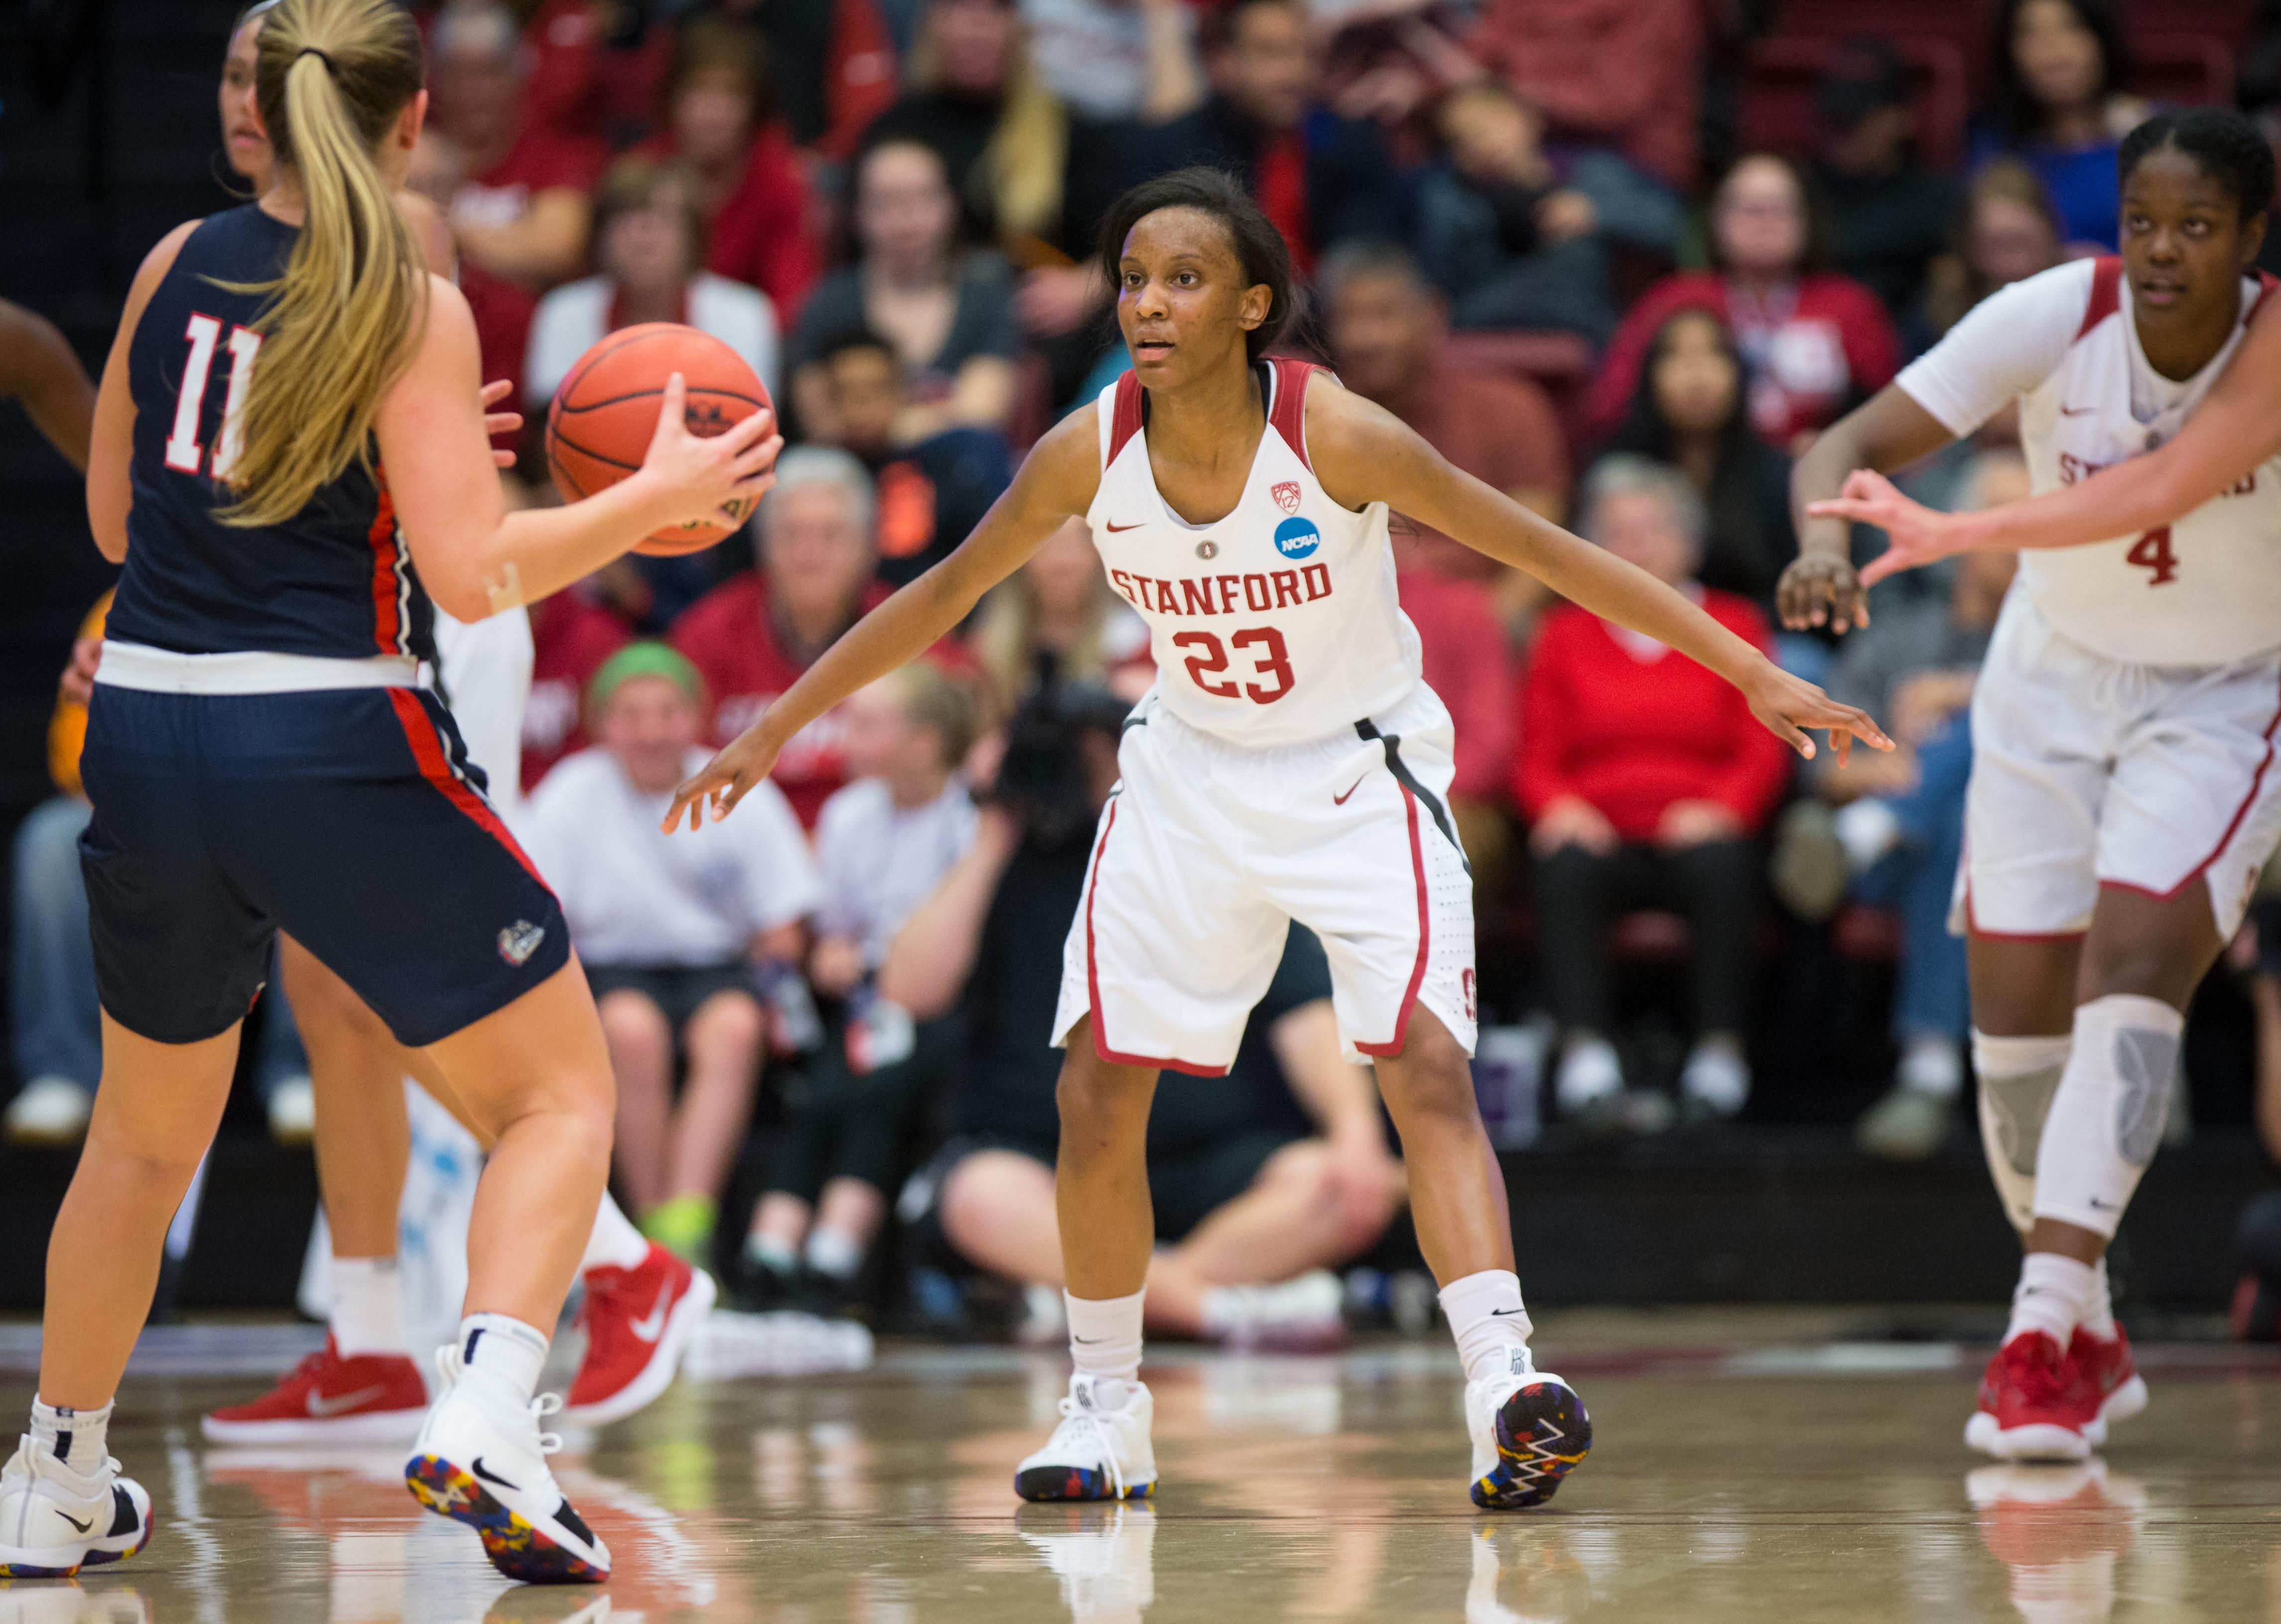 Women's basketball tames Bulldogs, advances to NCAA Round of 32